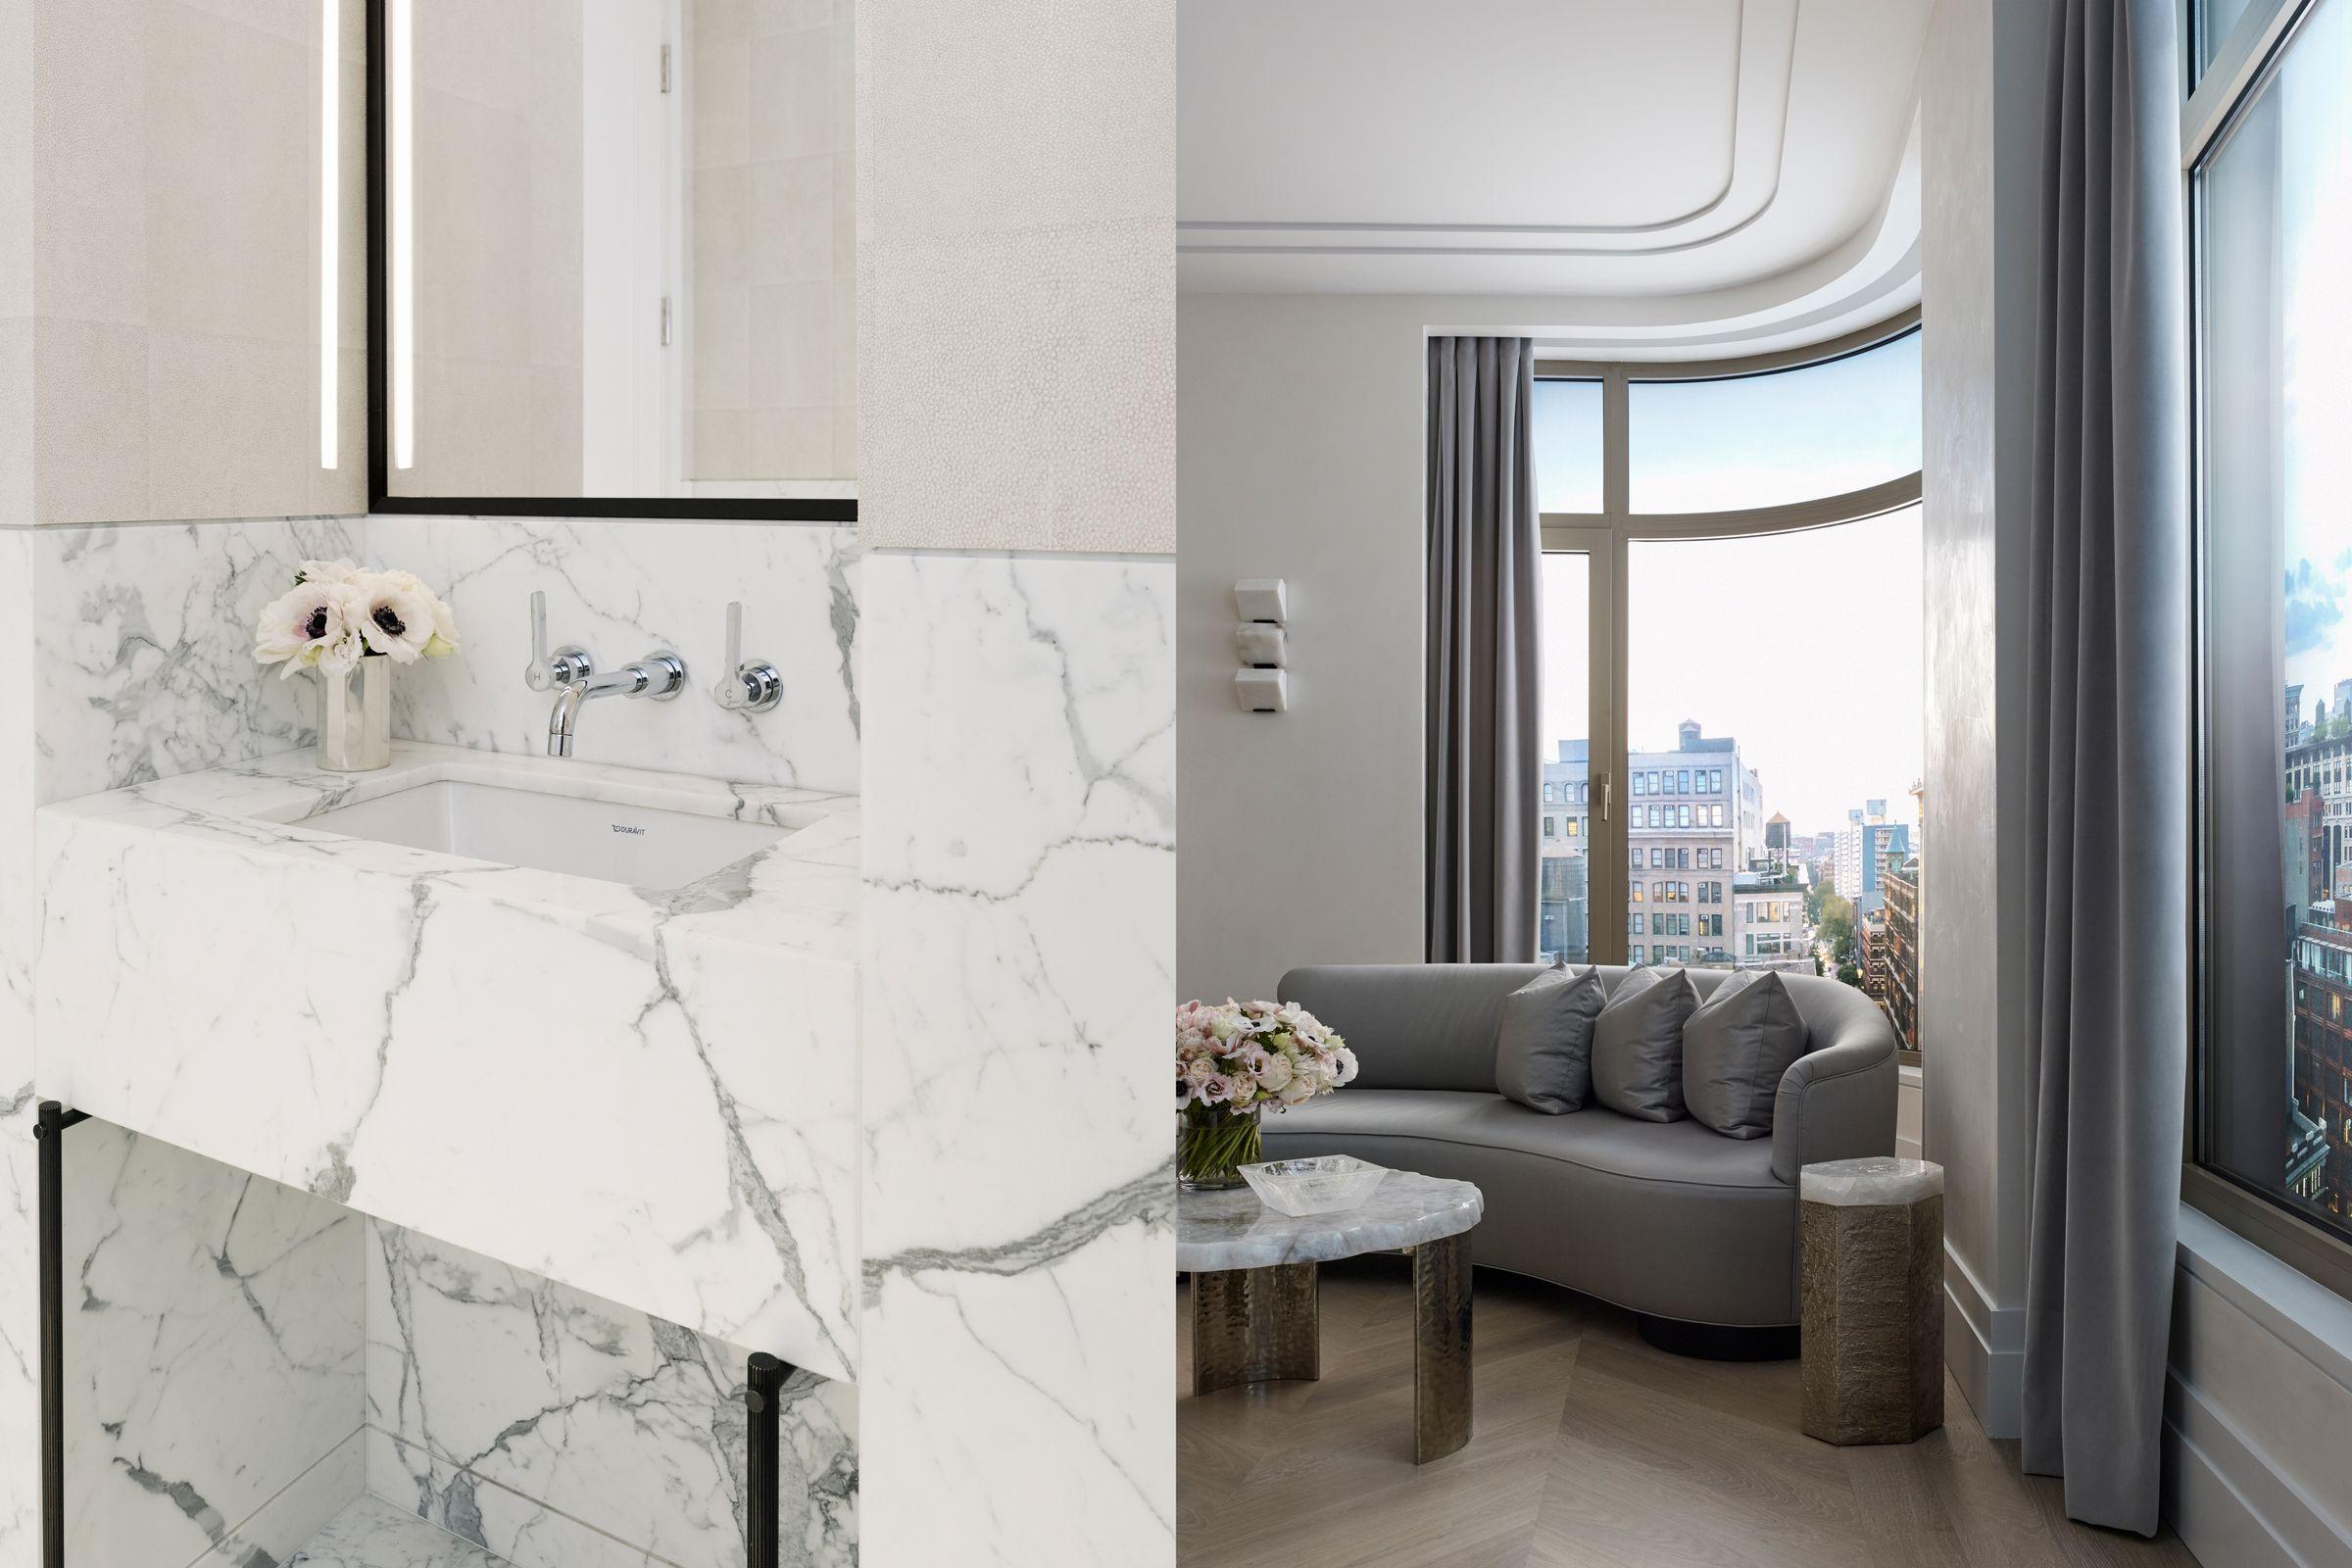 40 Bleecker interior photography bathroom and living room